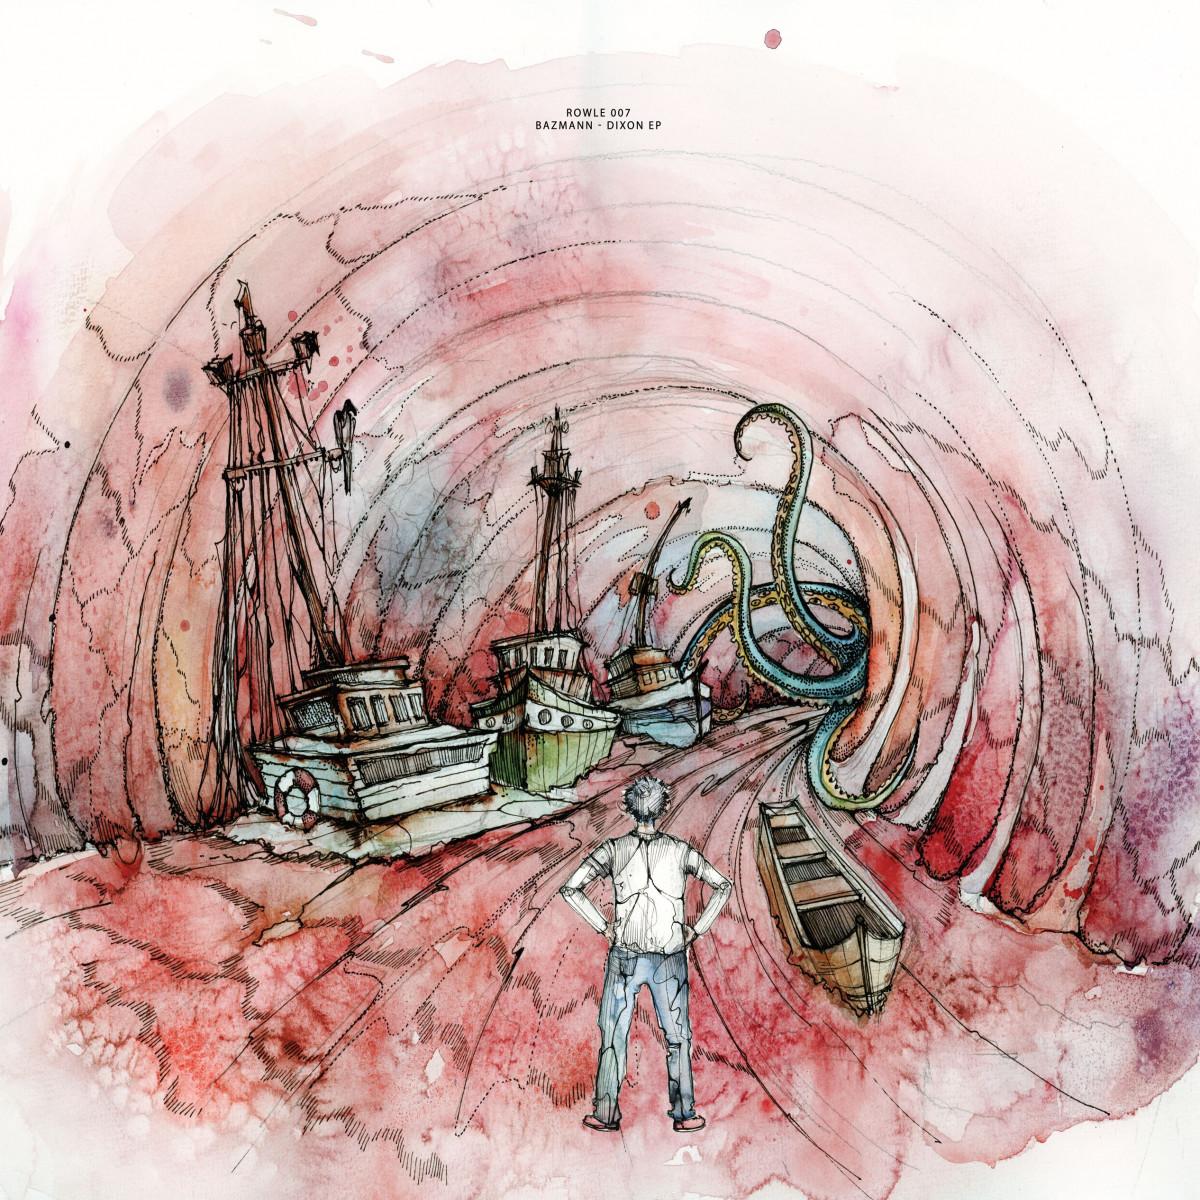 Bazmann (Nils Weimann & Stephan Bazbaz) - Dixon EP [Rowle]